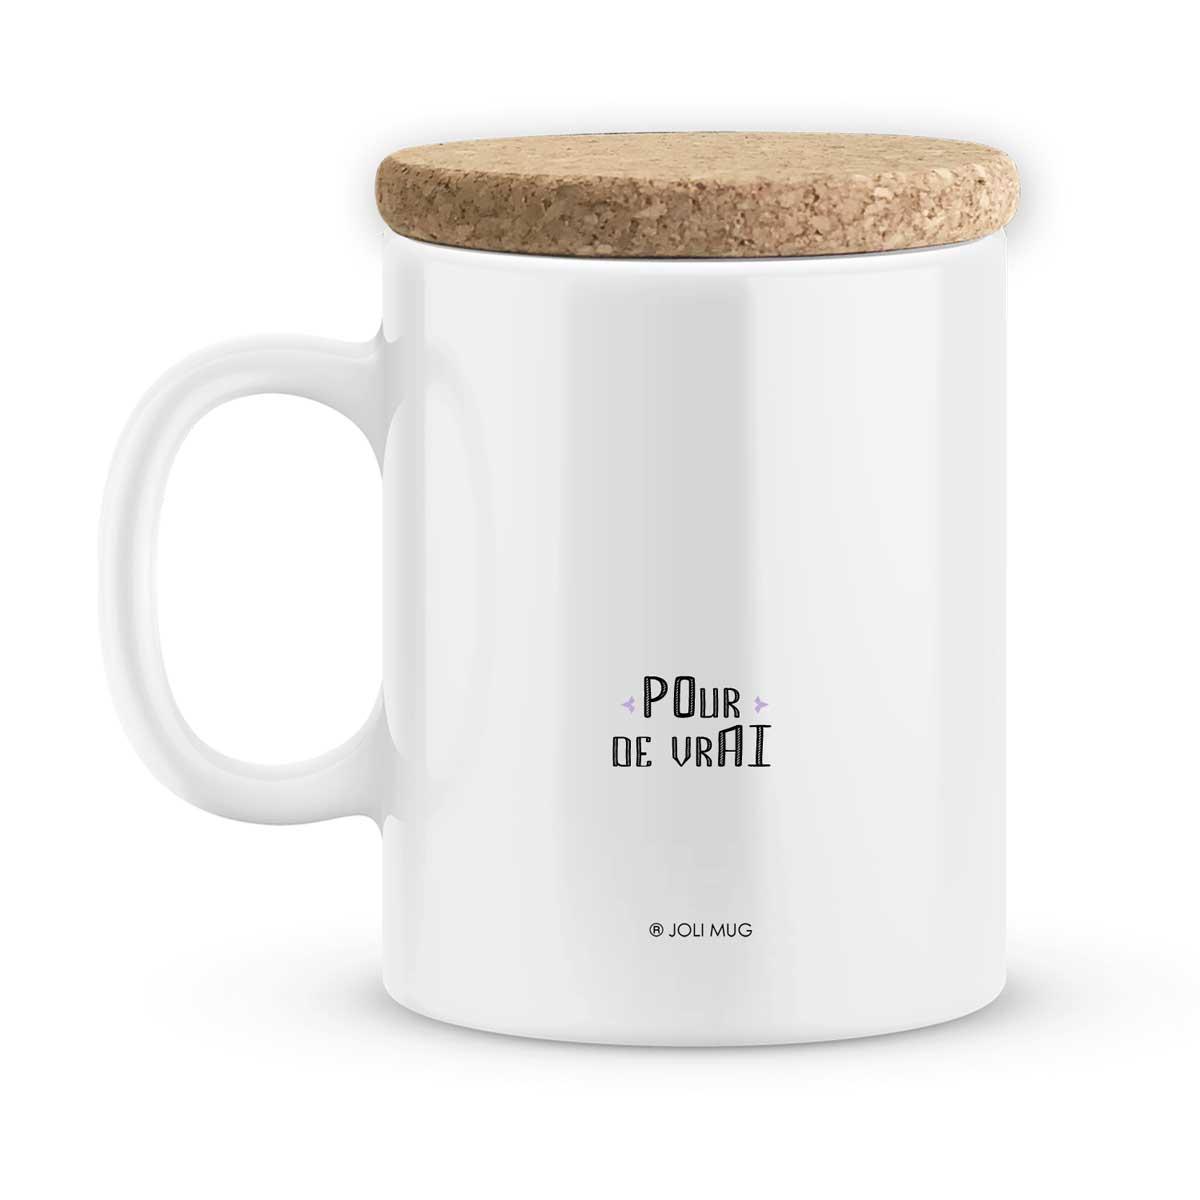 Cadeau naissance-Bapt/ême personnalis/é mug cadeau tata Mug meilleure tata du monde mug personnalis/é pour tata